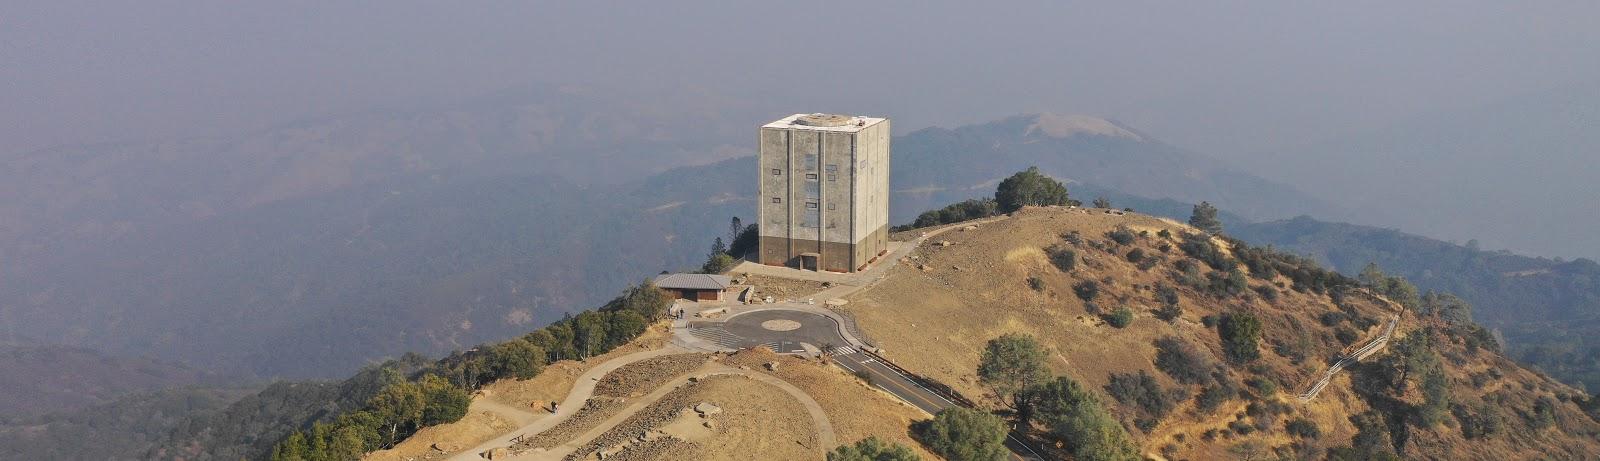 Drone photo of The Cube at top of Mt Umunhum Santa Clara County